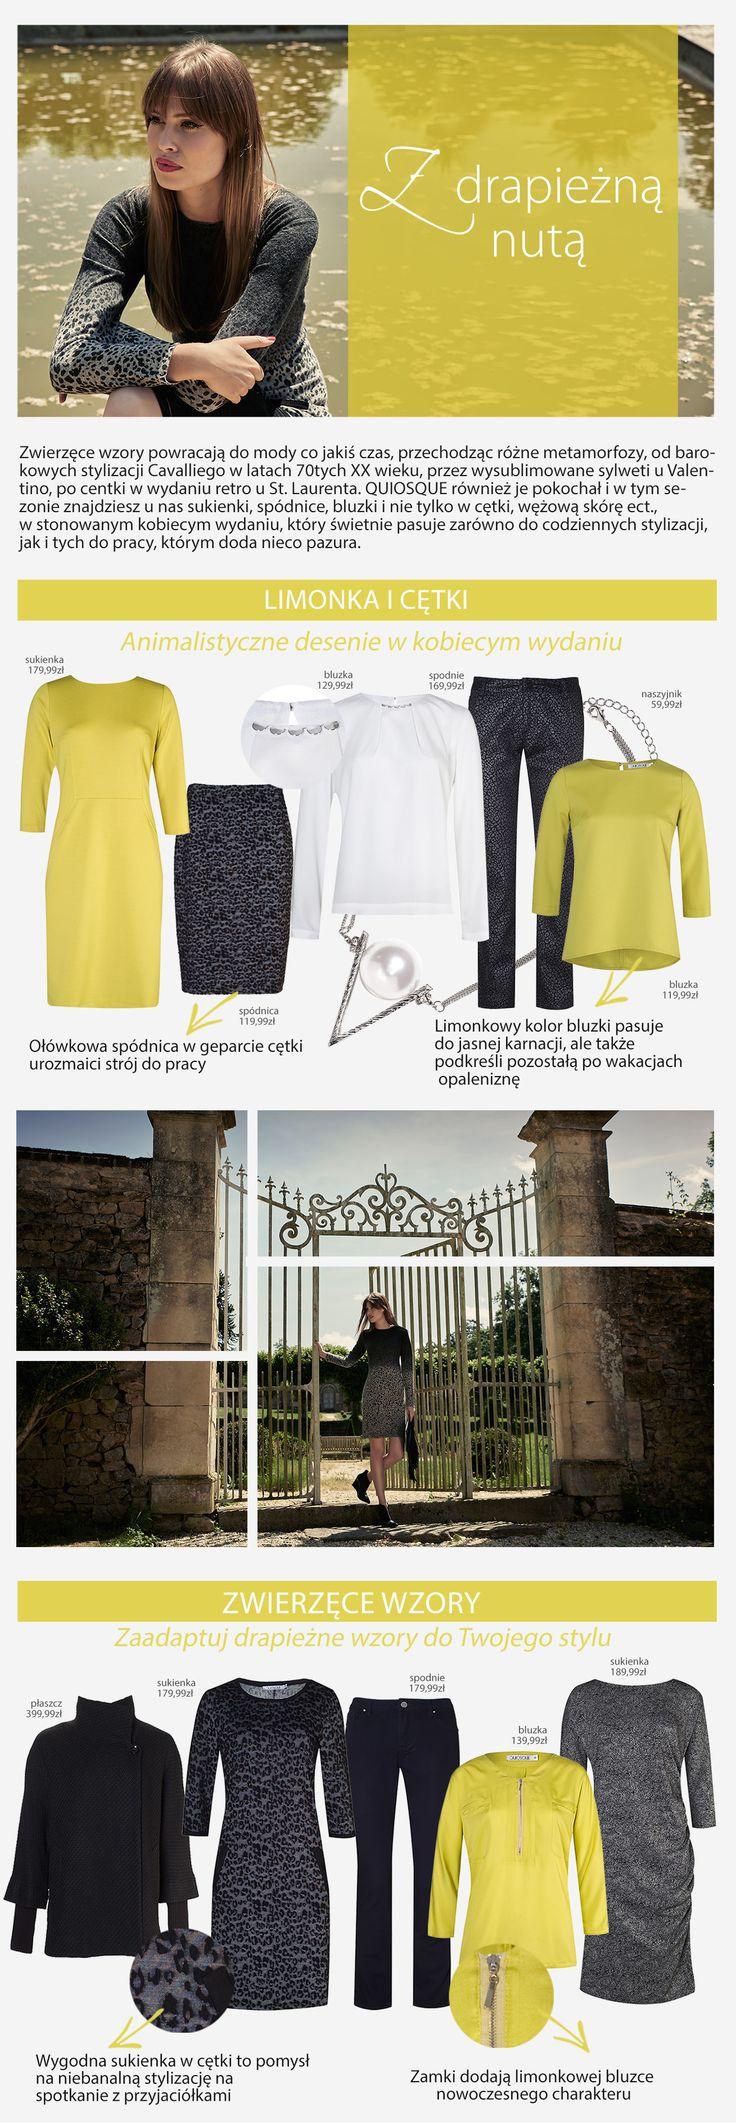 #quiosquepl #quiosque #naszeinspiracje #poniedzialek #monday #new #collection #lady #style #print #animalprint #details #colour #colourful #dress #bag #blouse #feminine #kobieco #nadruk #womanwear #trends #inspirations